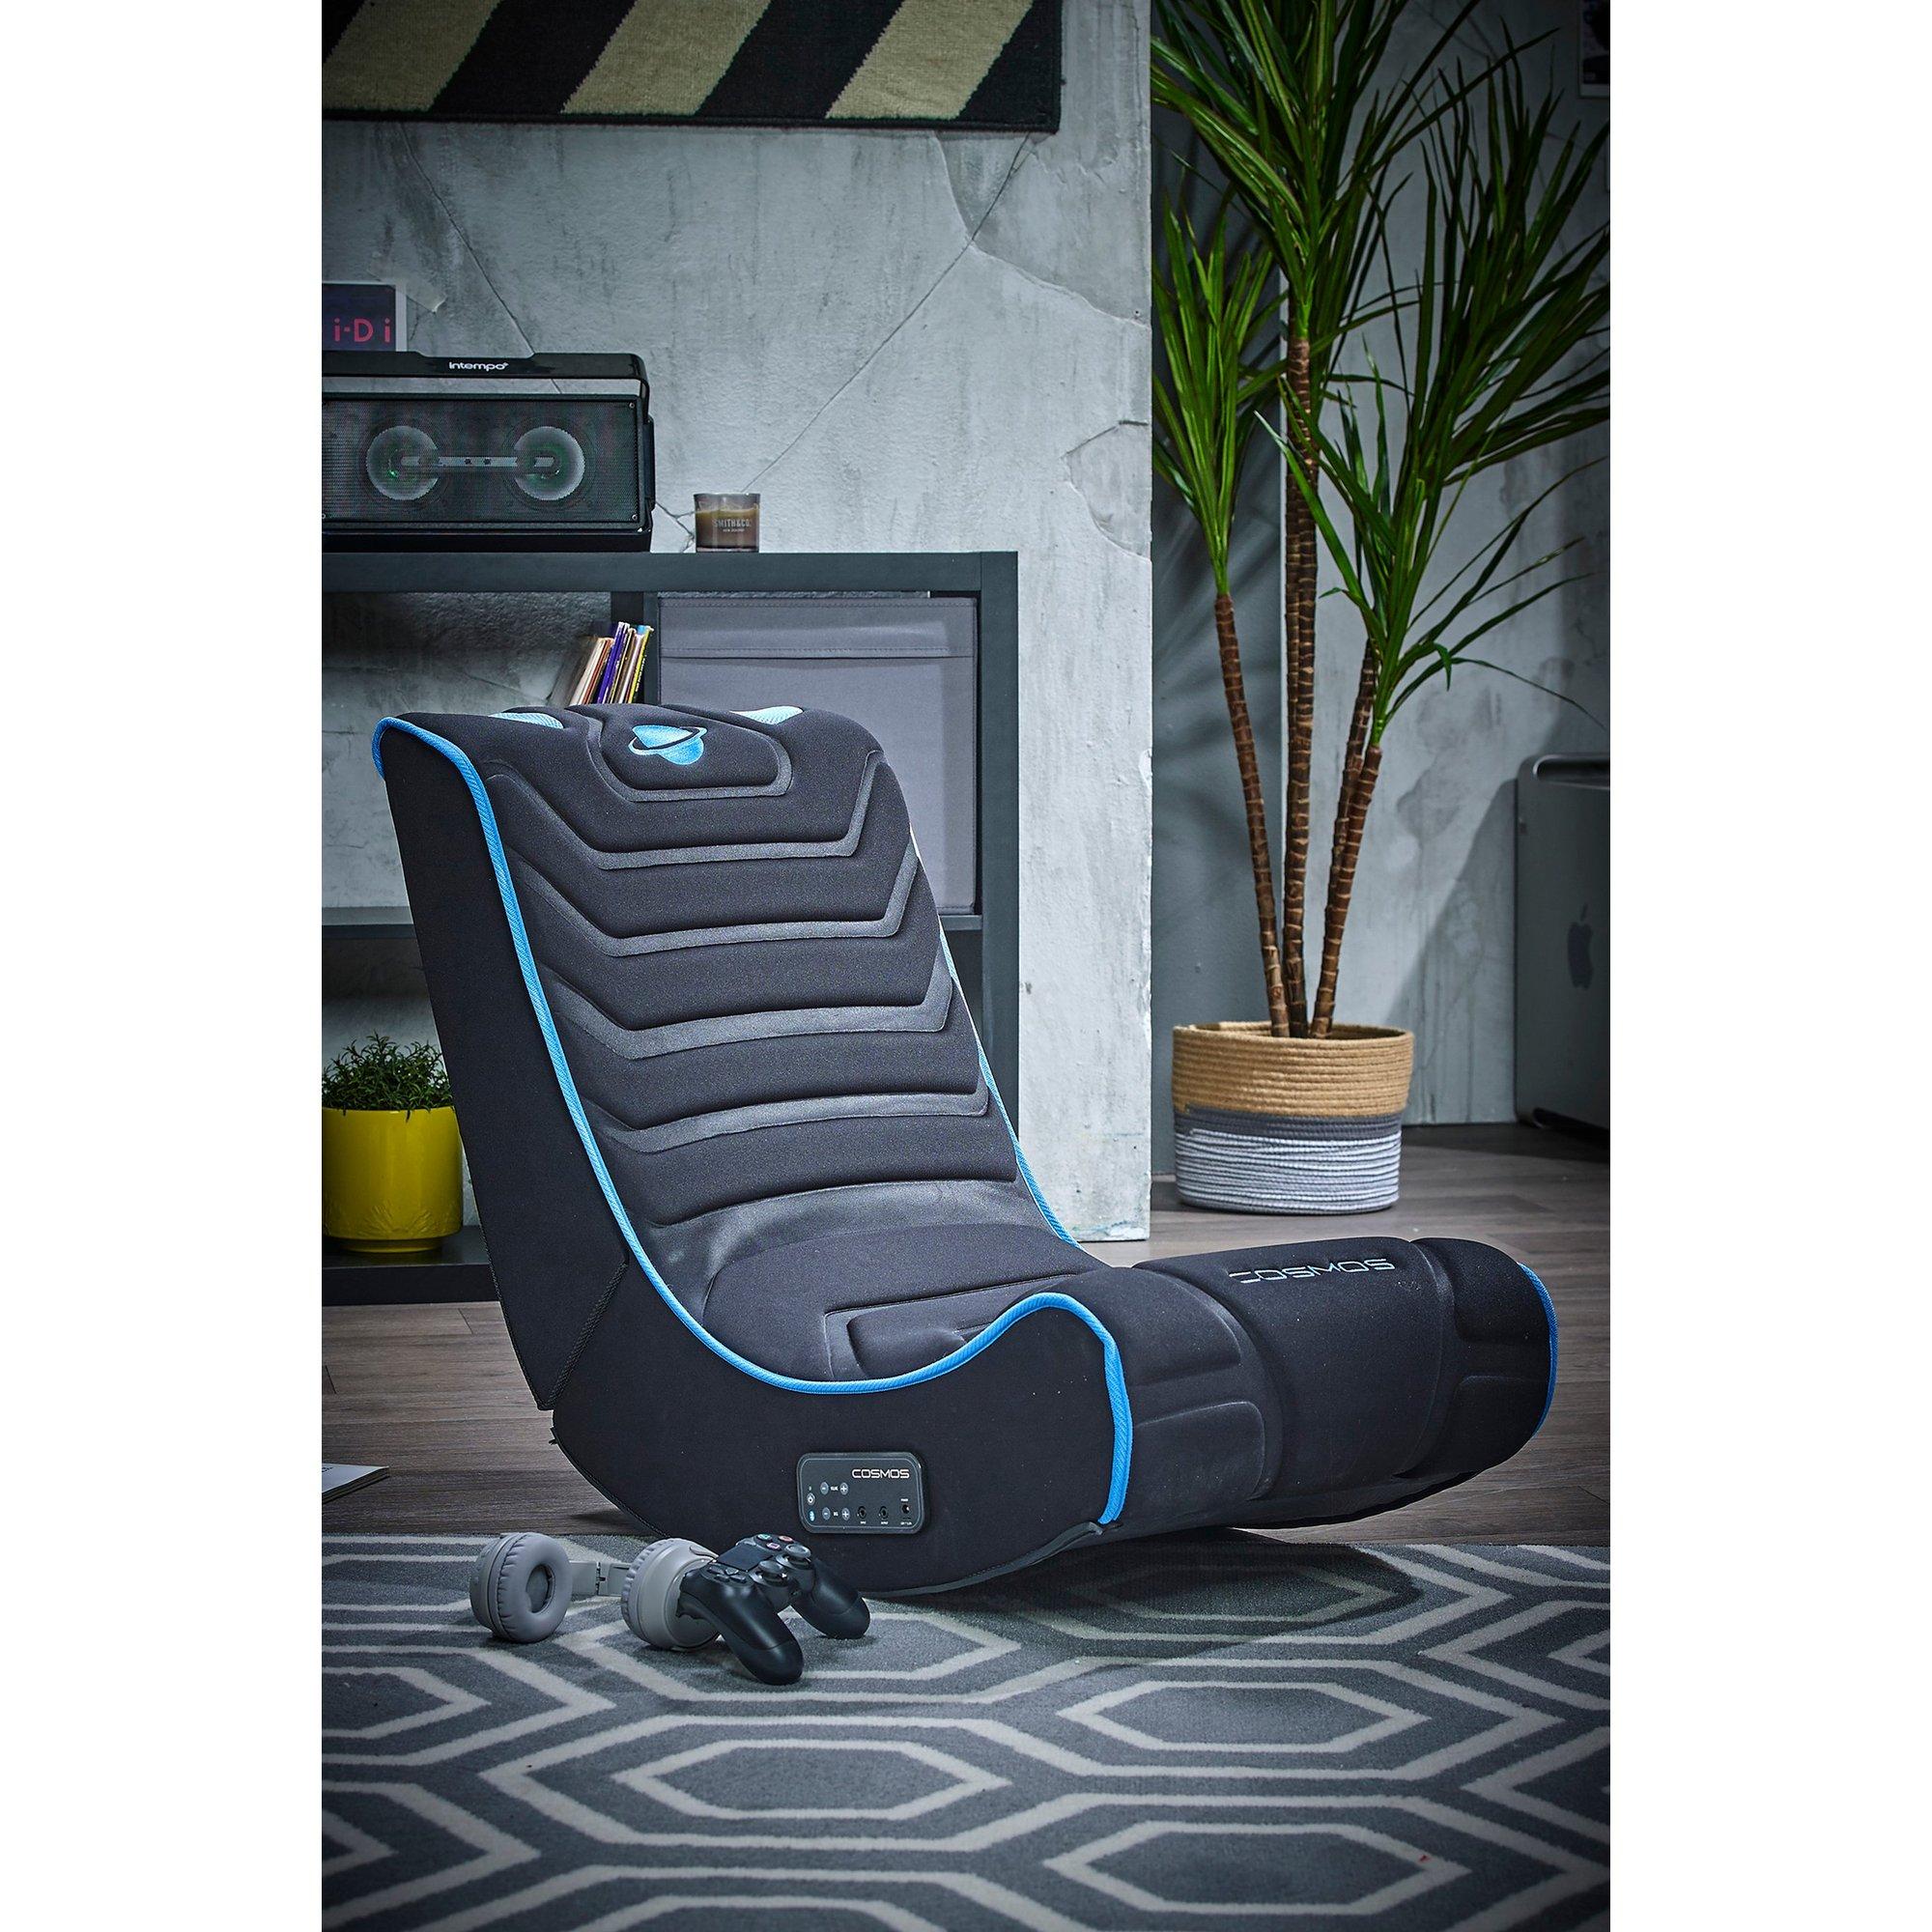 Image of Cosmos 2.1 Meteor Rocking Gaming Chair